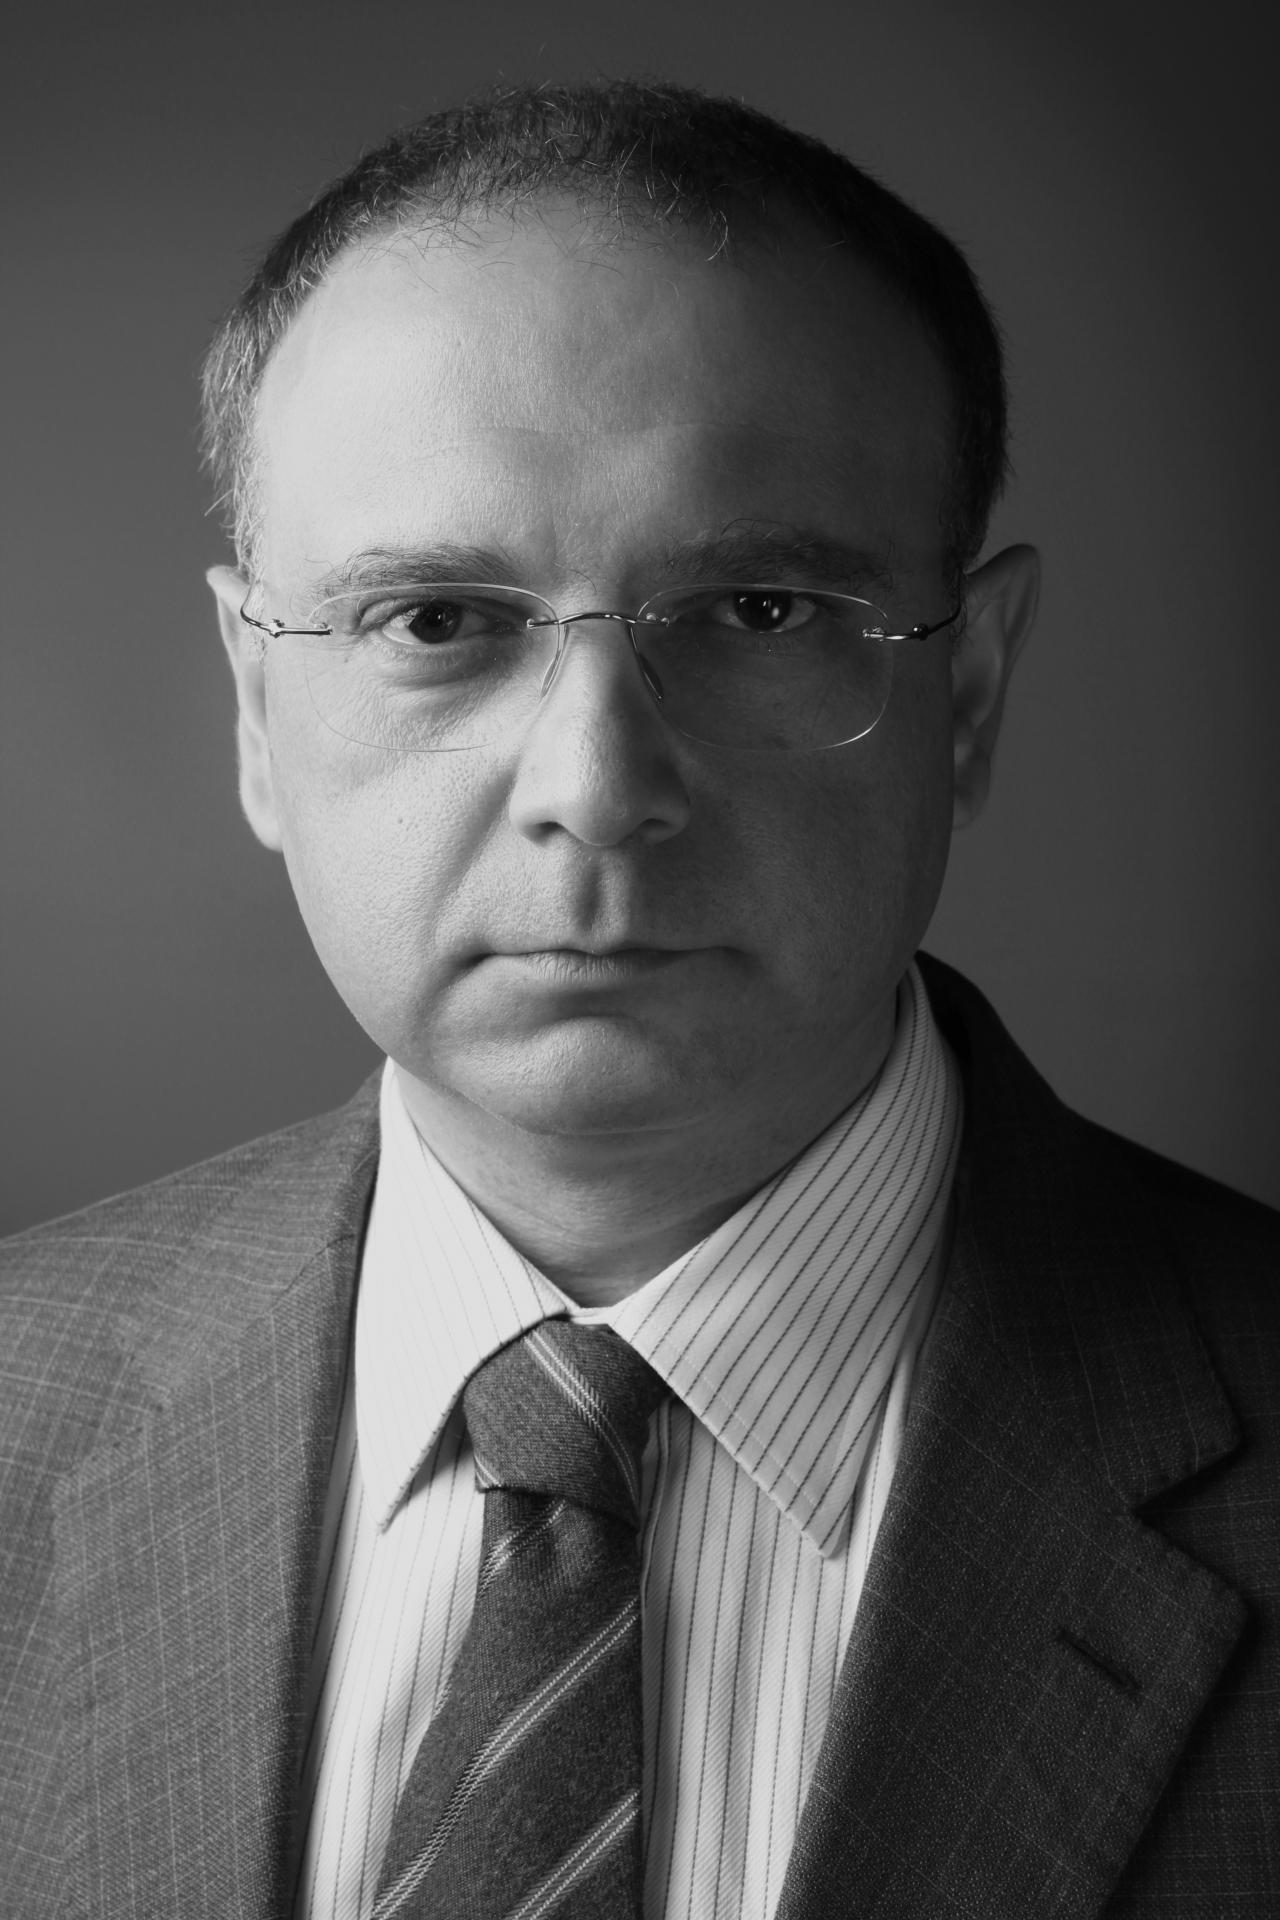 Кравцов Николай